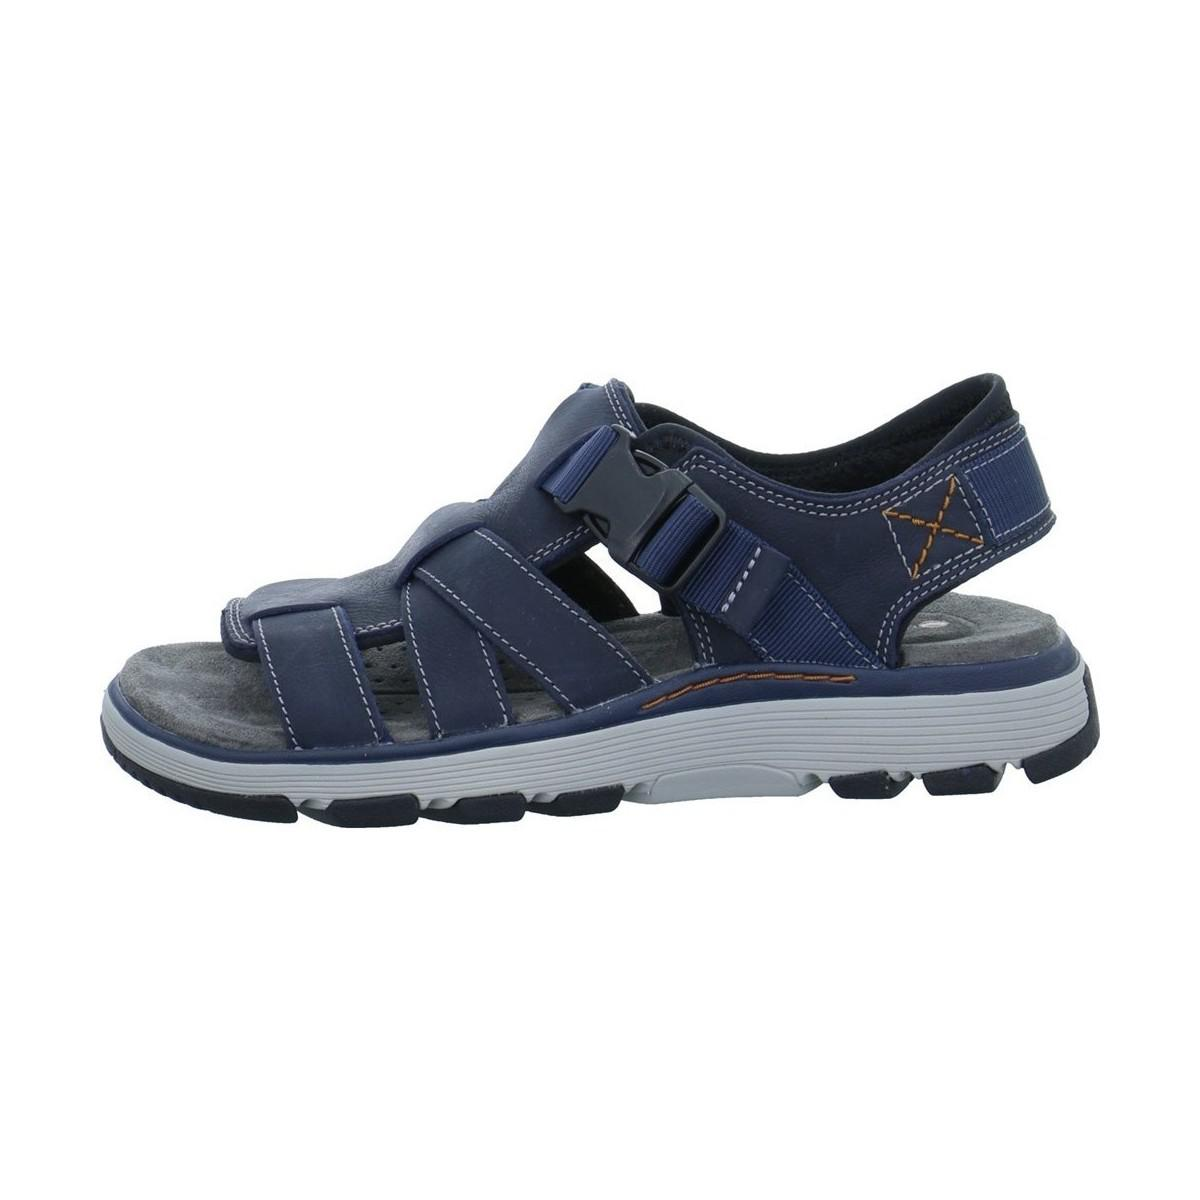 04e55eb91546 Clarks Un Trek Cove Men s Sandals In Blue in Blue for Men - Lyst